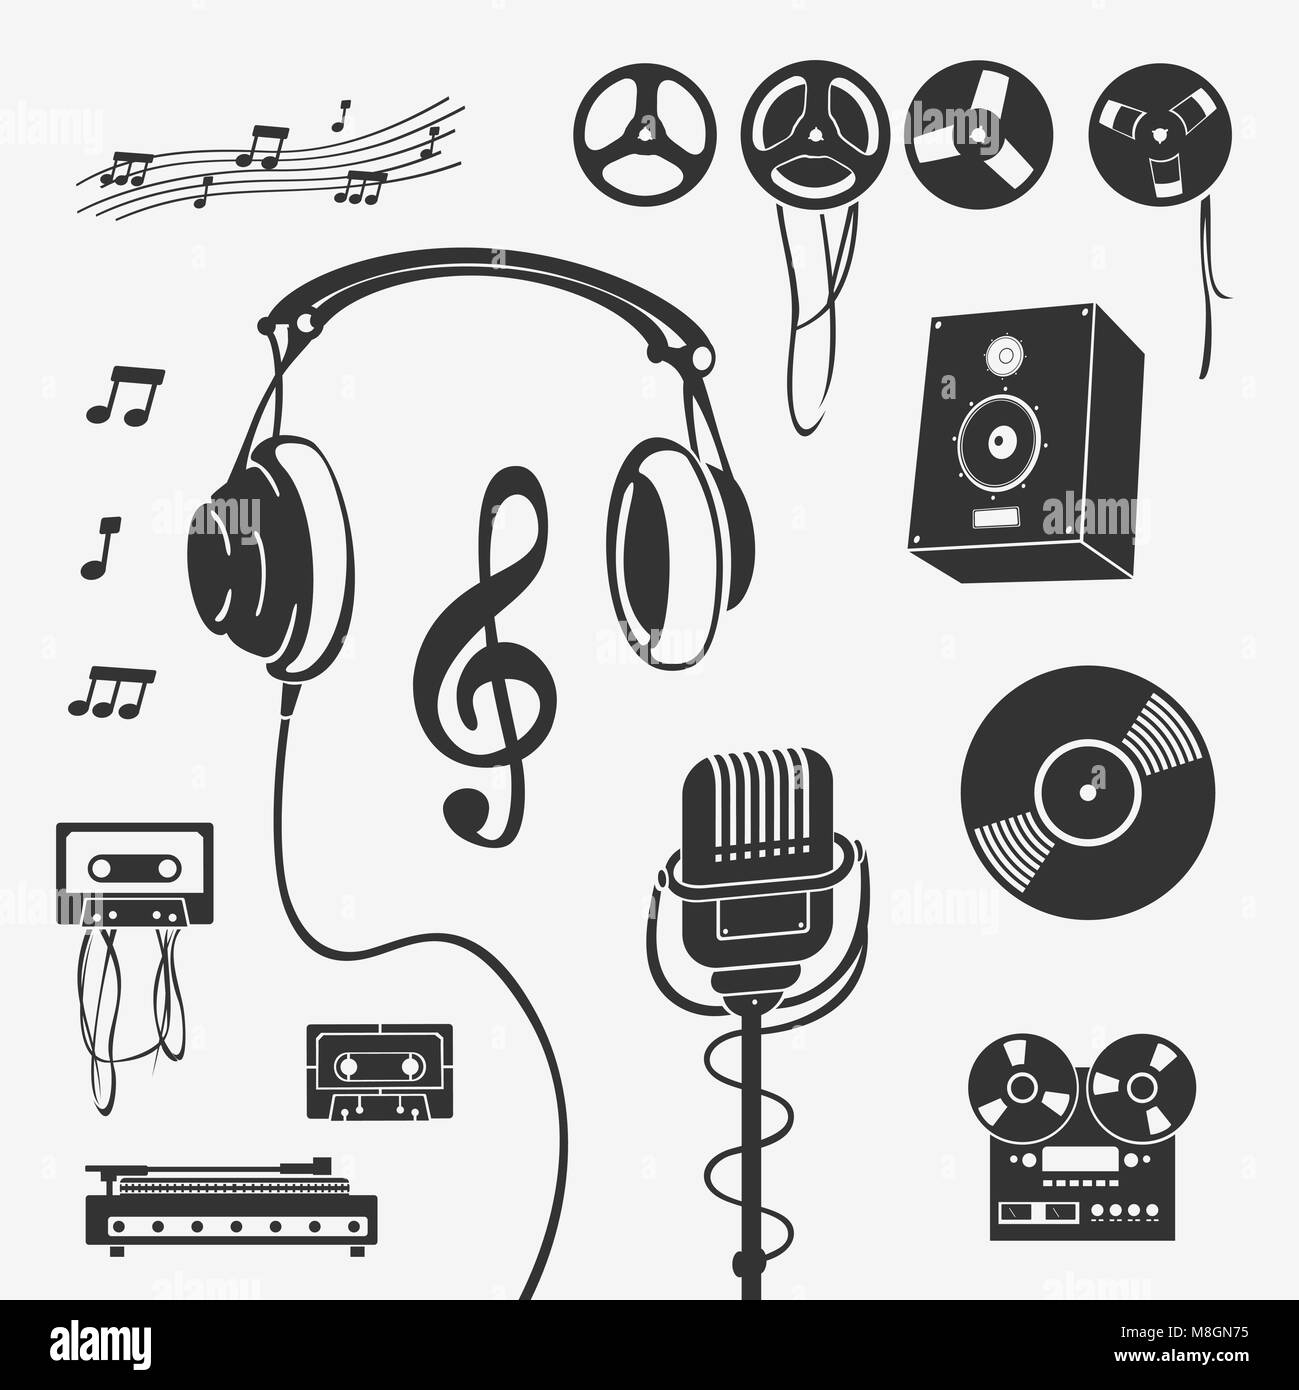 Set Of Symbols Musical Instrument Stock Vector Art Illustration